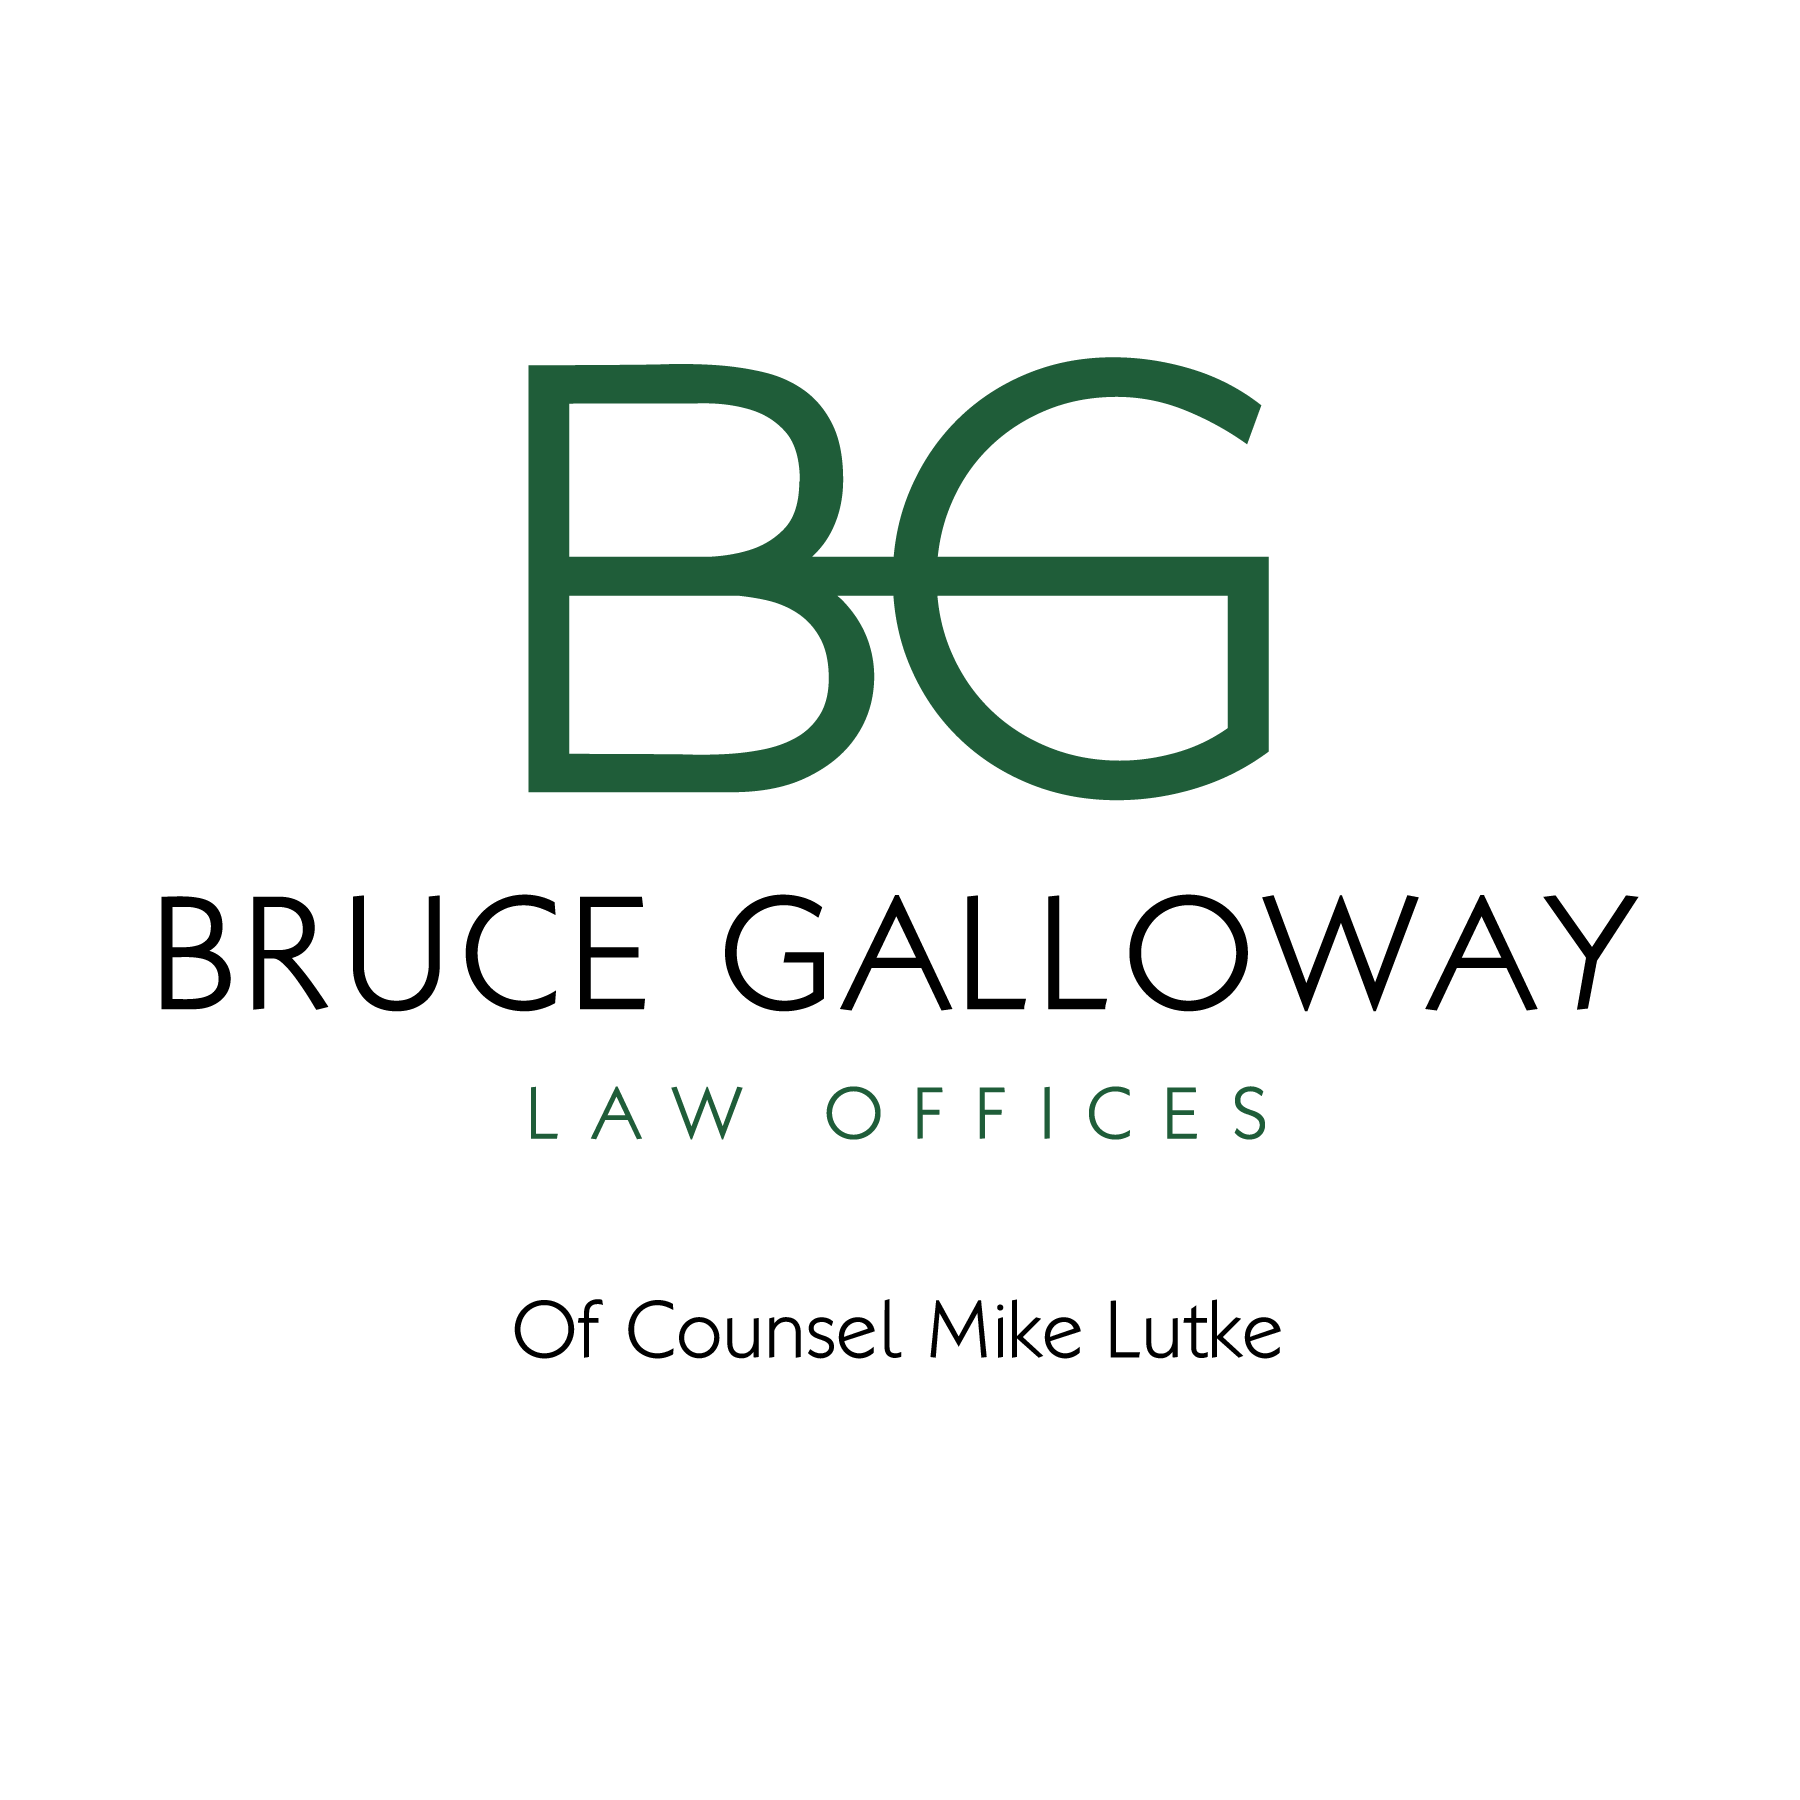 Bruce Galloway LLC